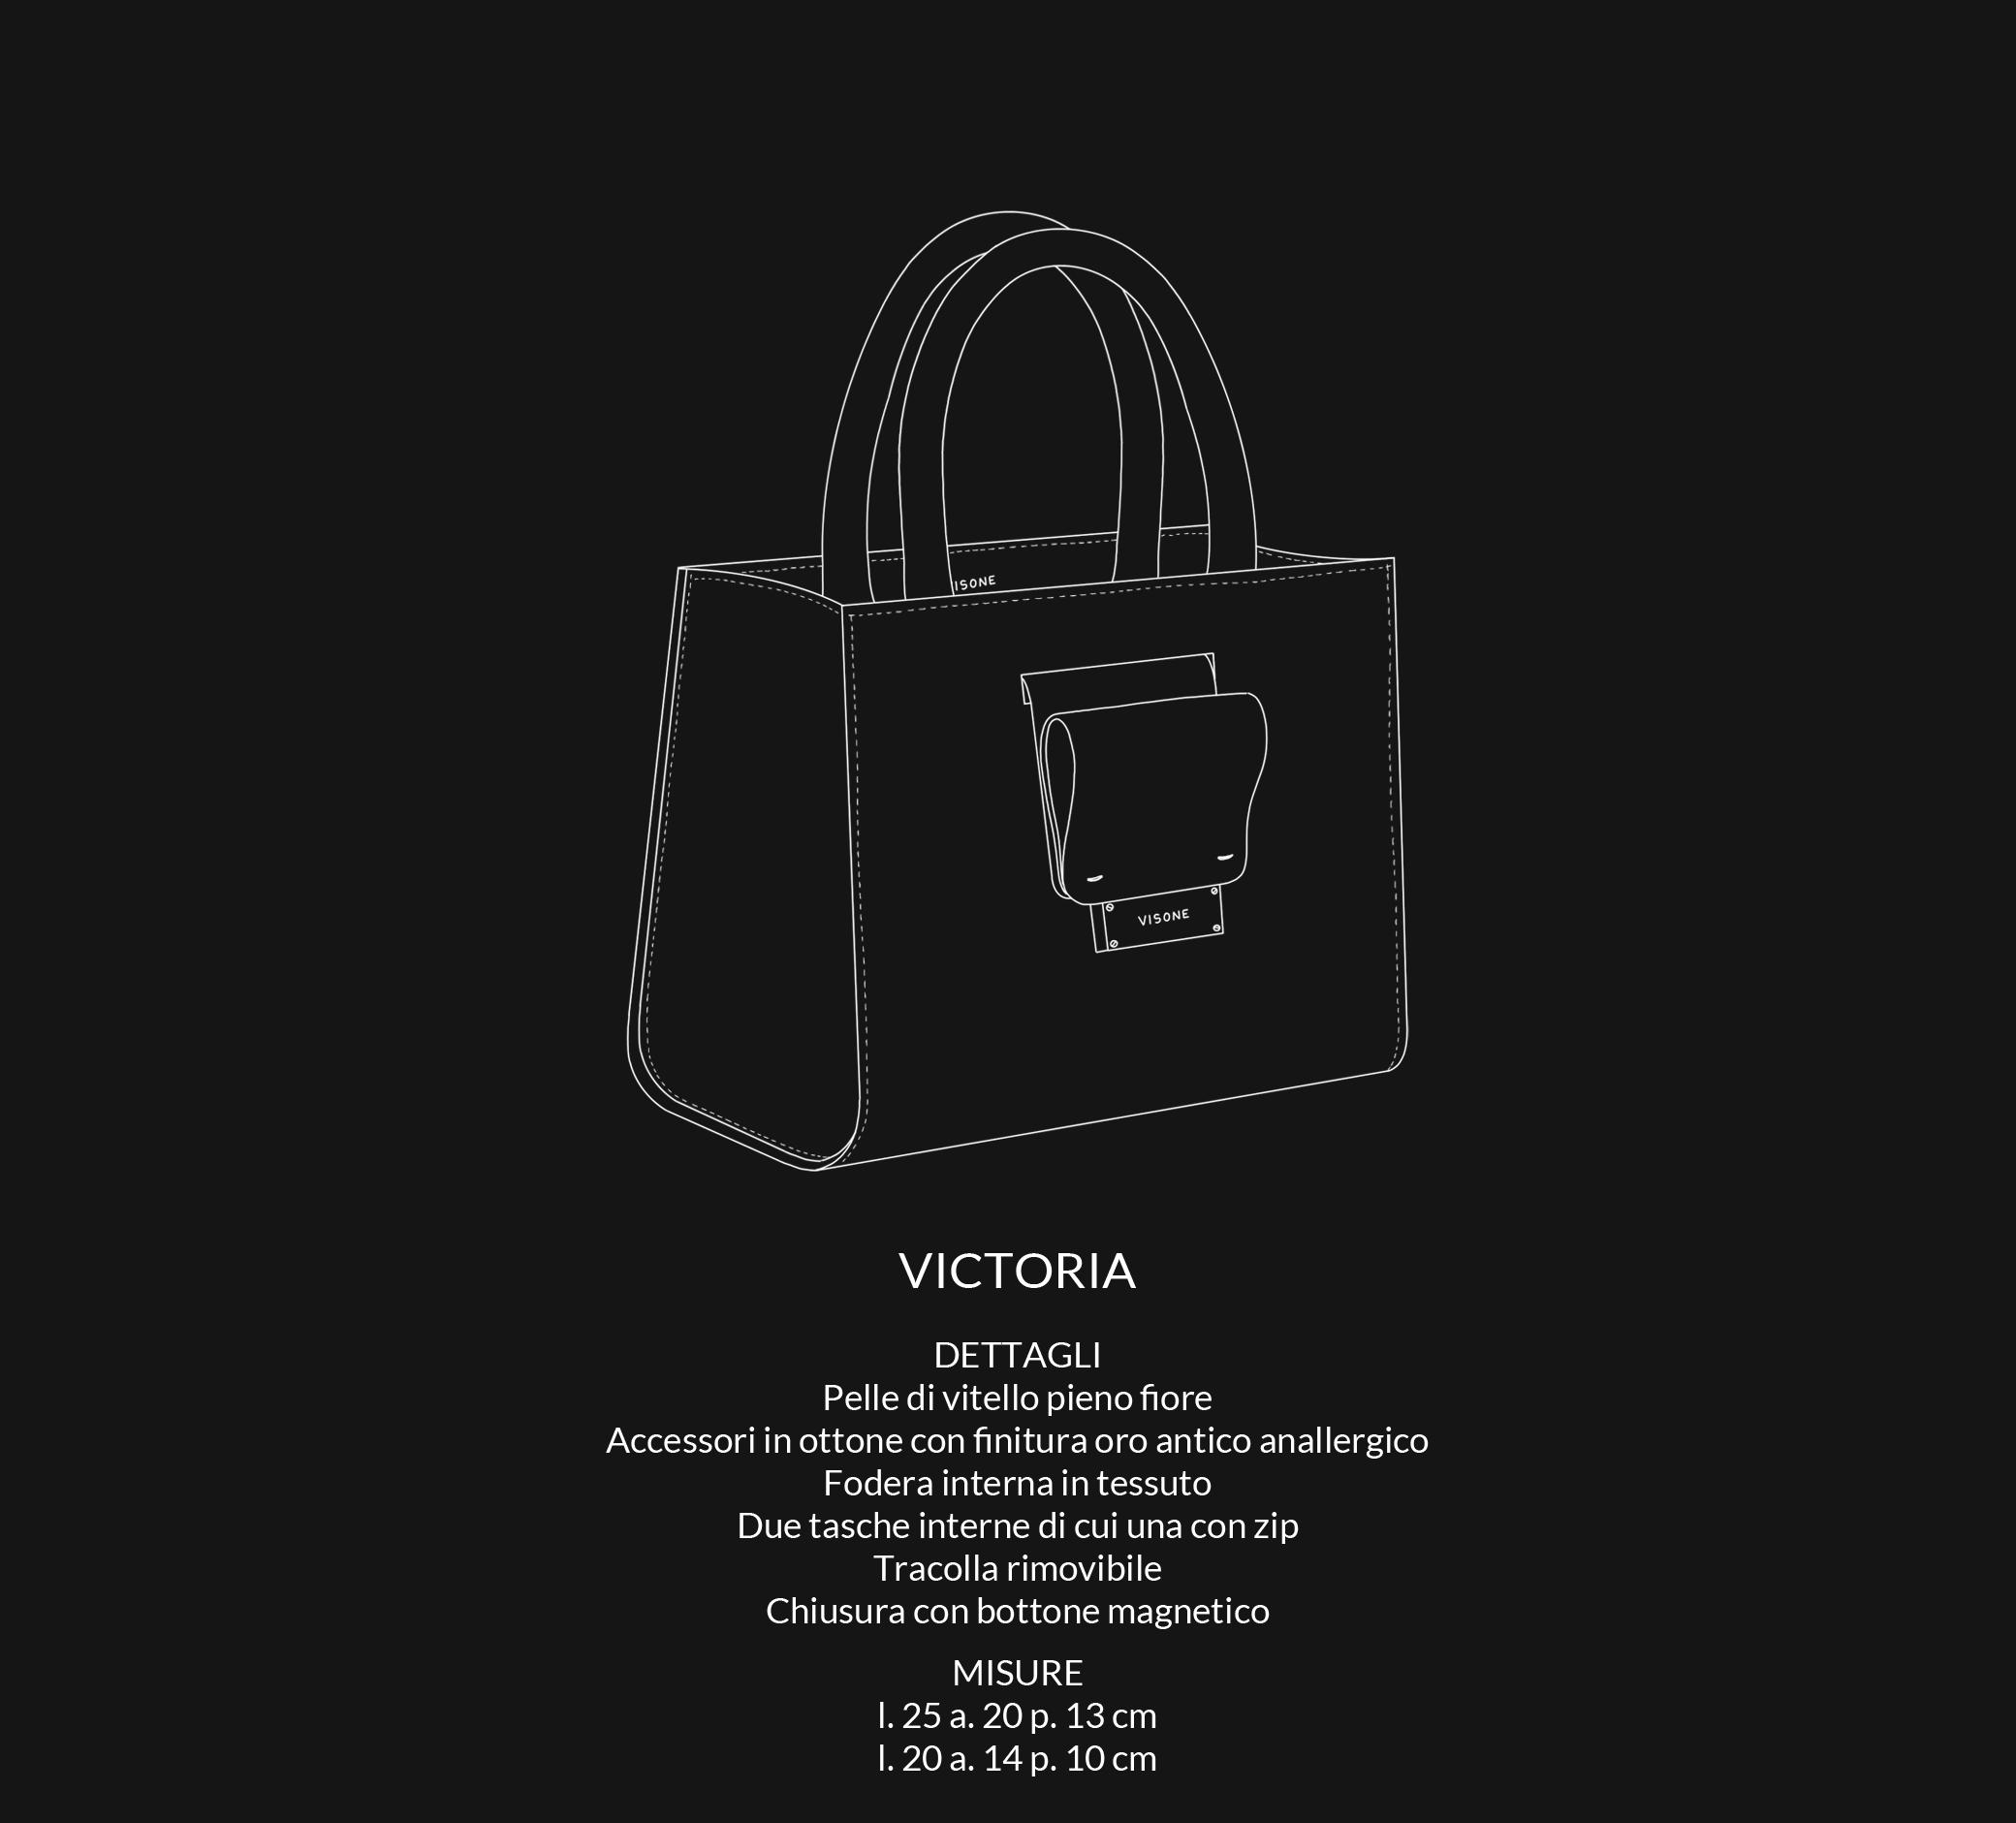 victoriacategoria-1